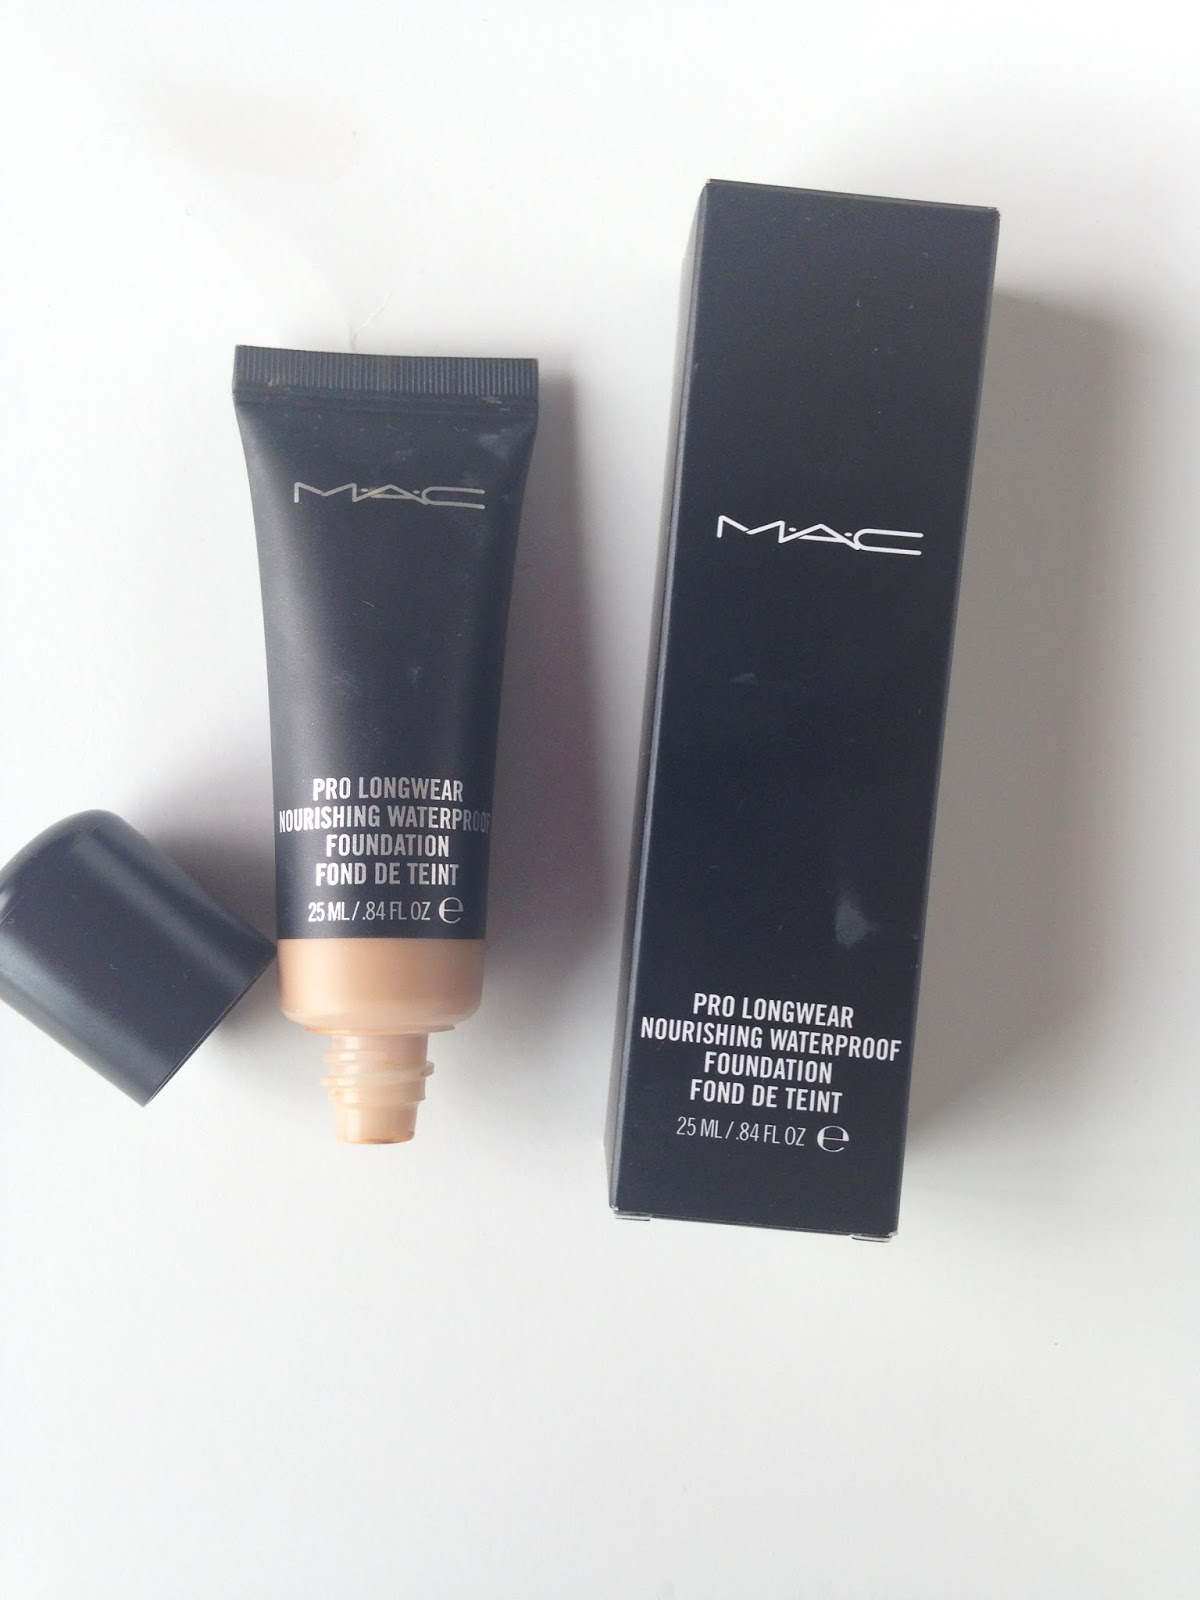 Pro Foundation Mixers By Nyx Professional Makeup: Makeup Check: MAC: Pro Longwear Nourishing Waterproof